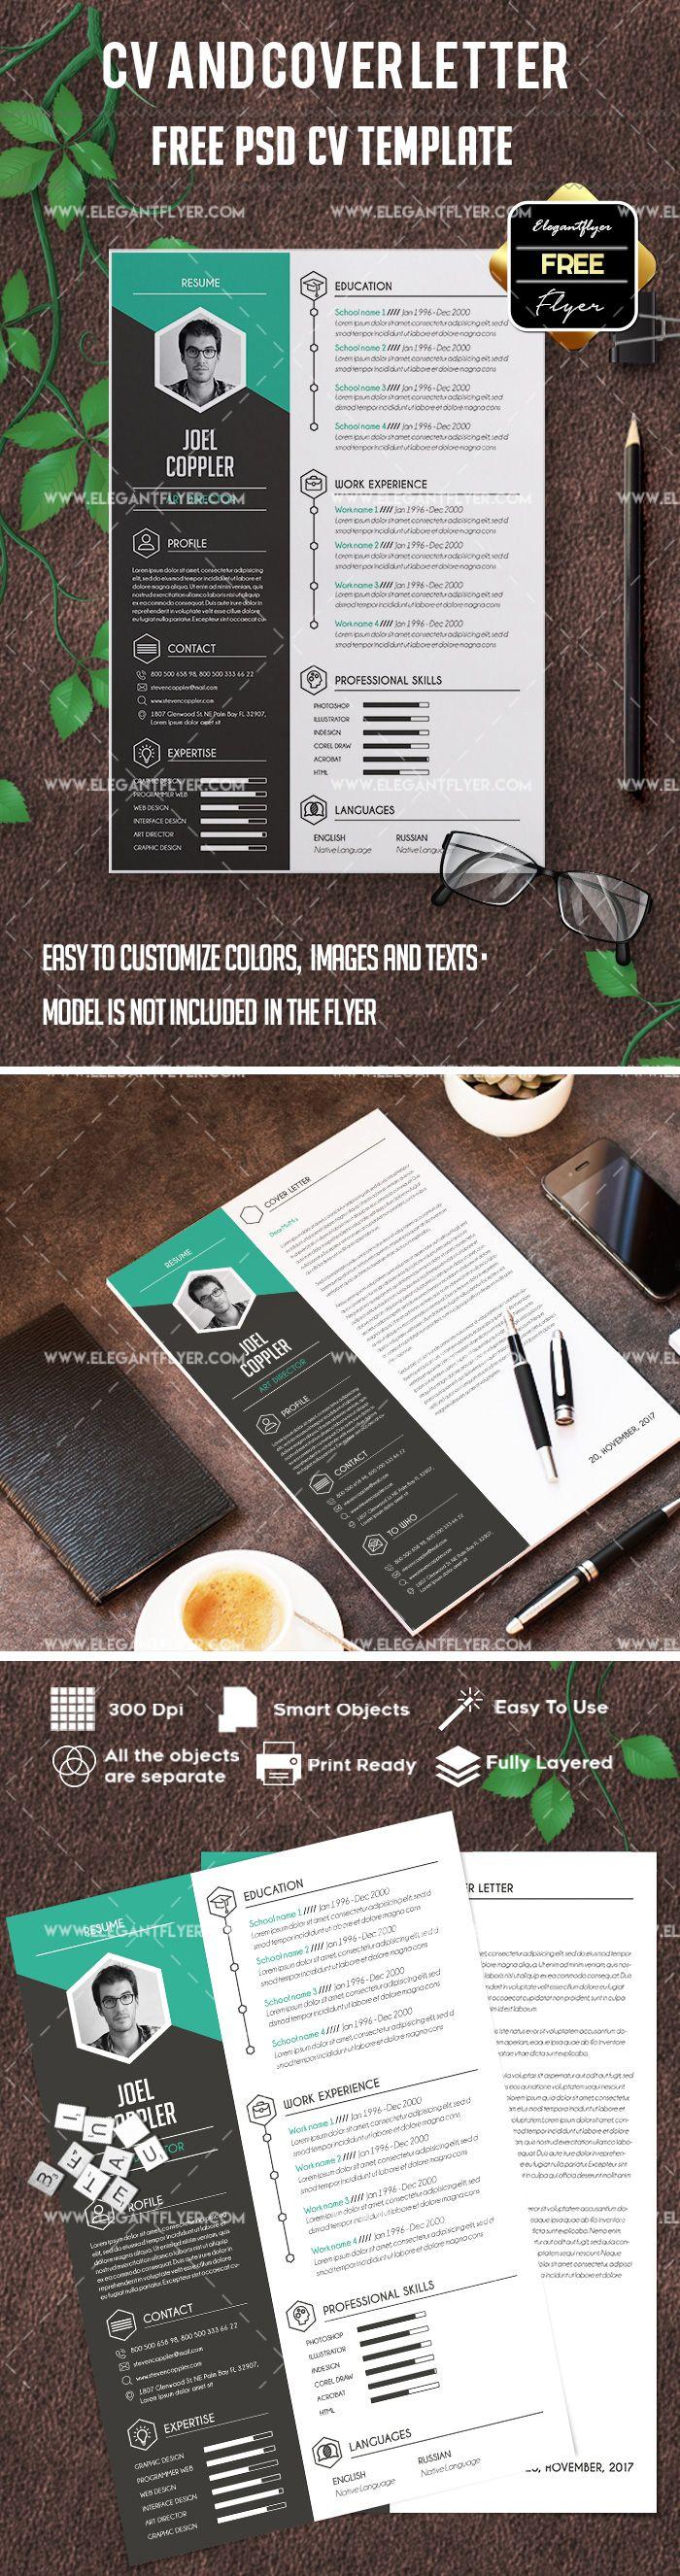 free printable cover letters for resumes%0A https   www elegantflyer com freeresumetemplates